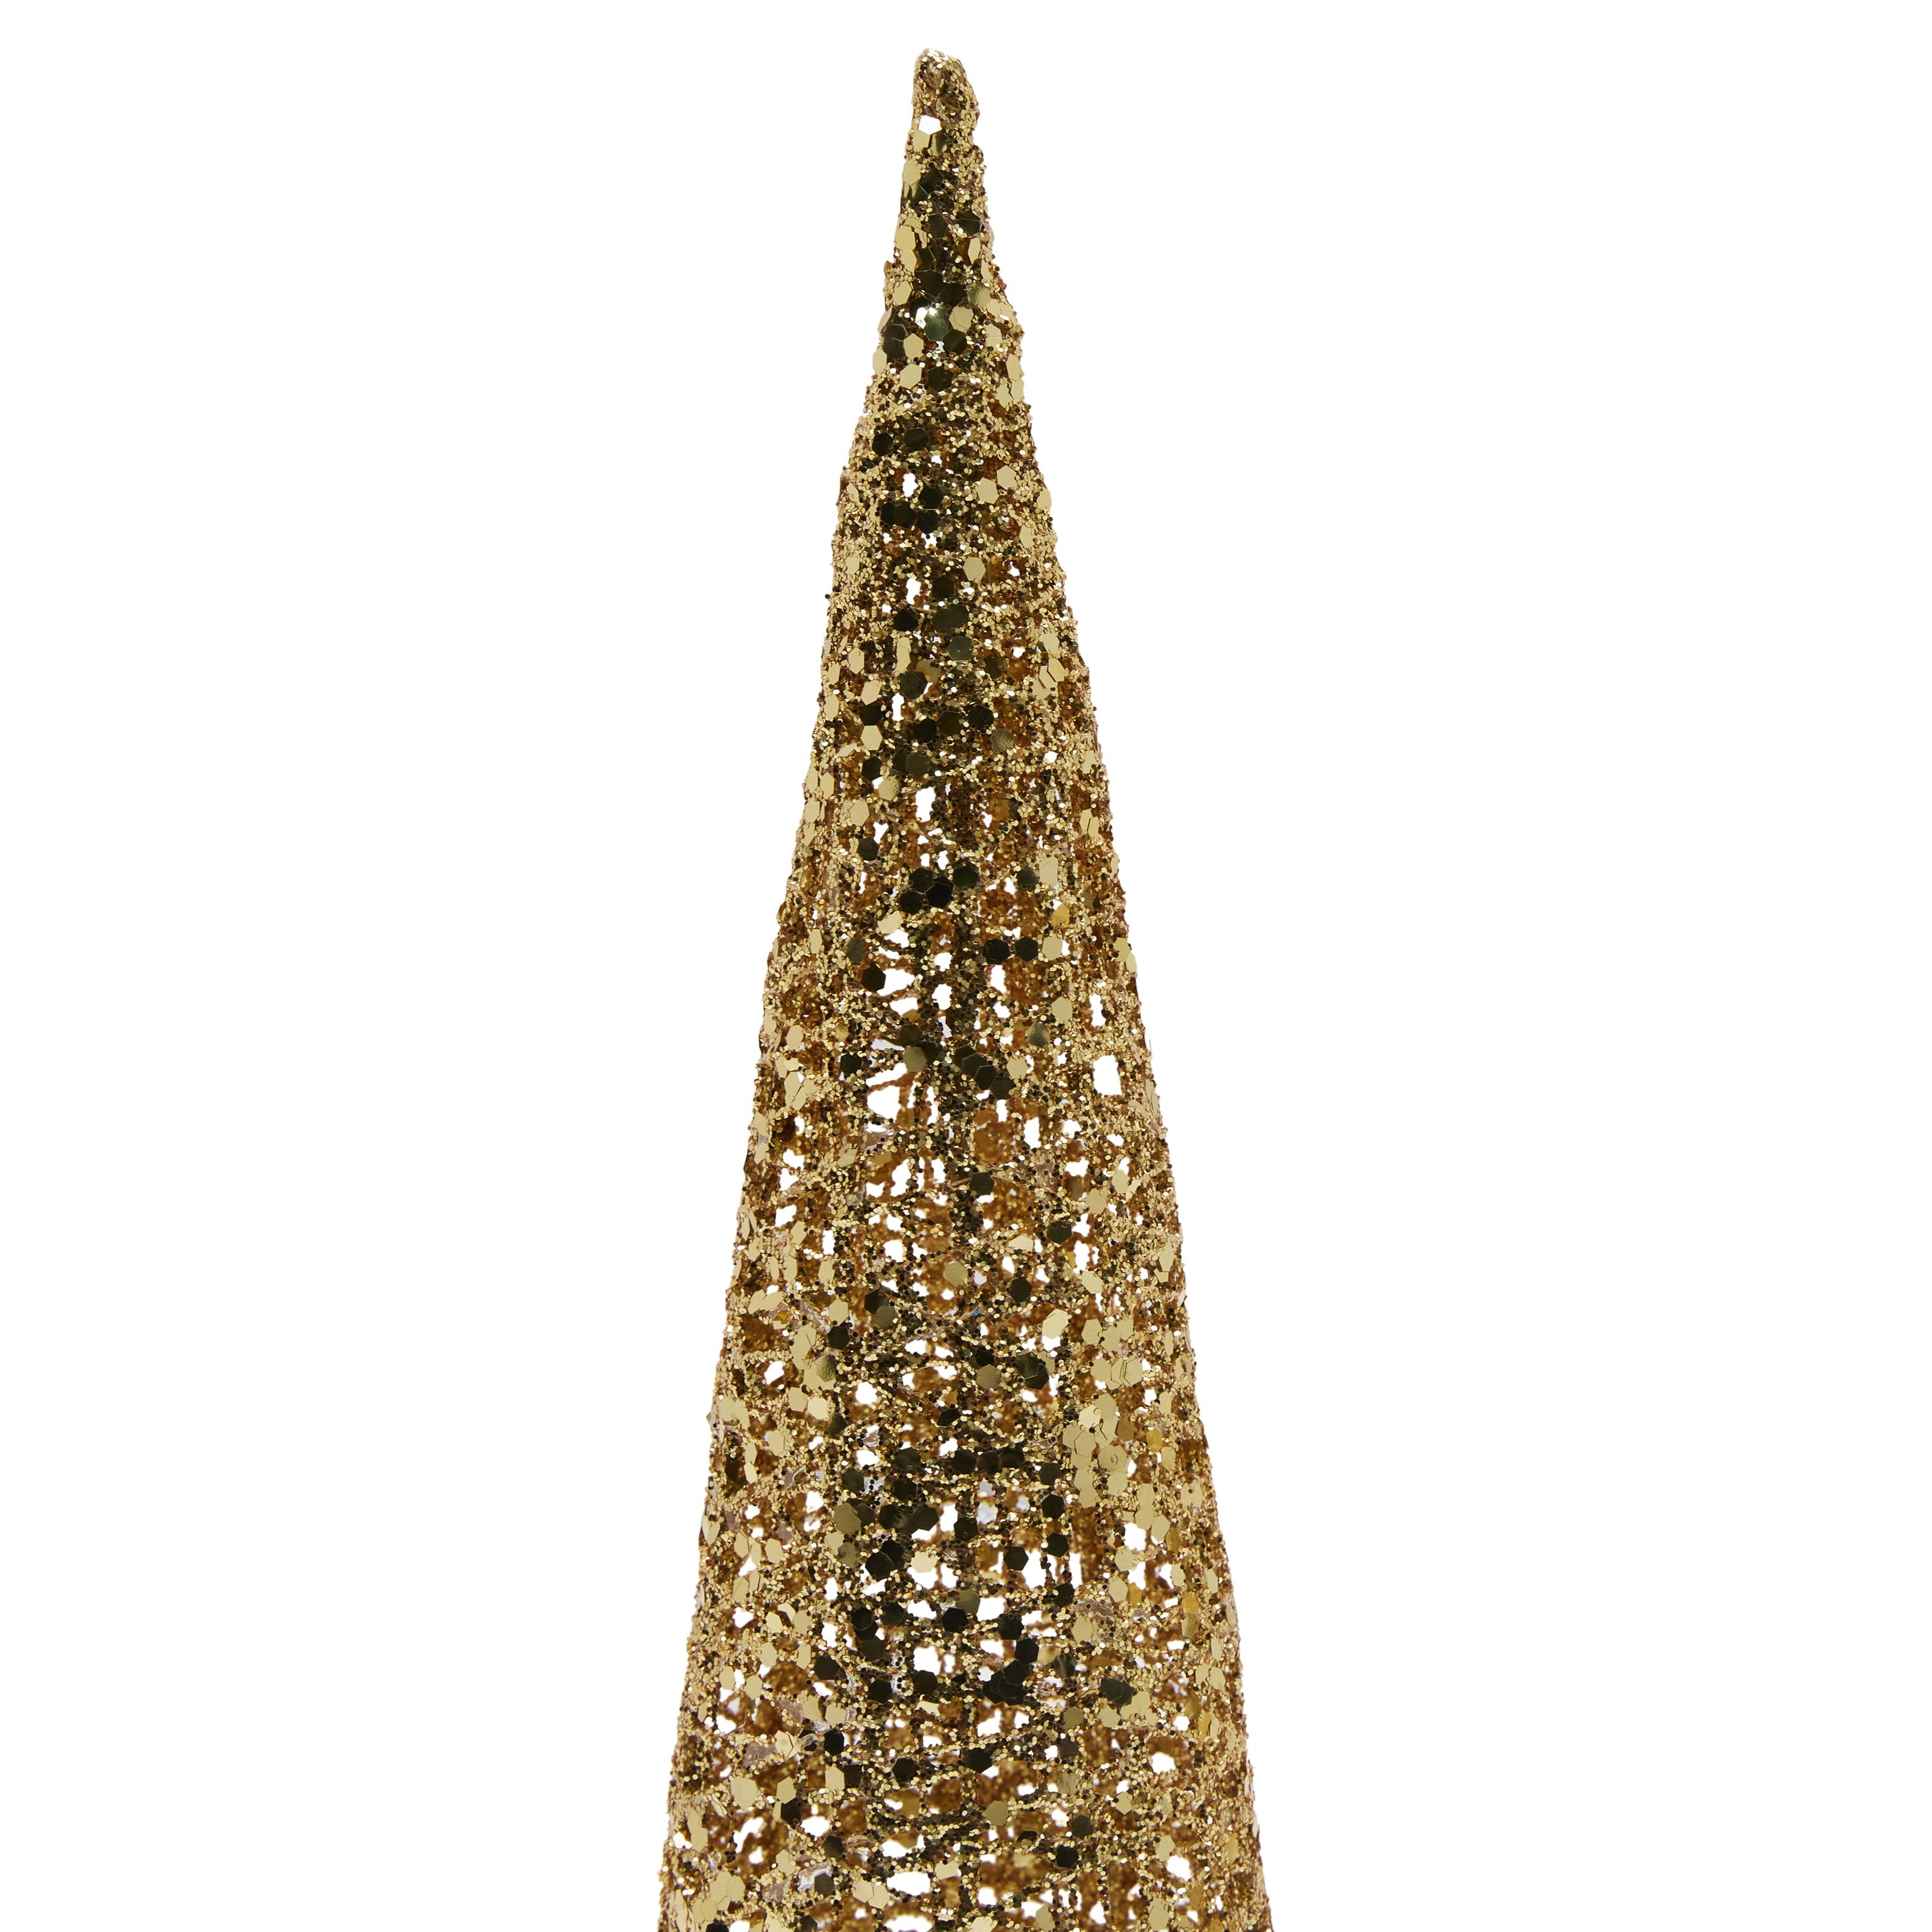 Bead Kit Sparkling Mesh Christmas Decoration Winter Skies